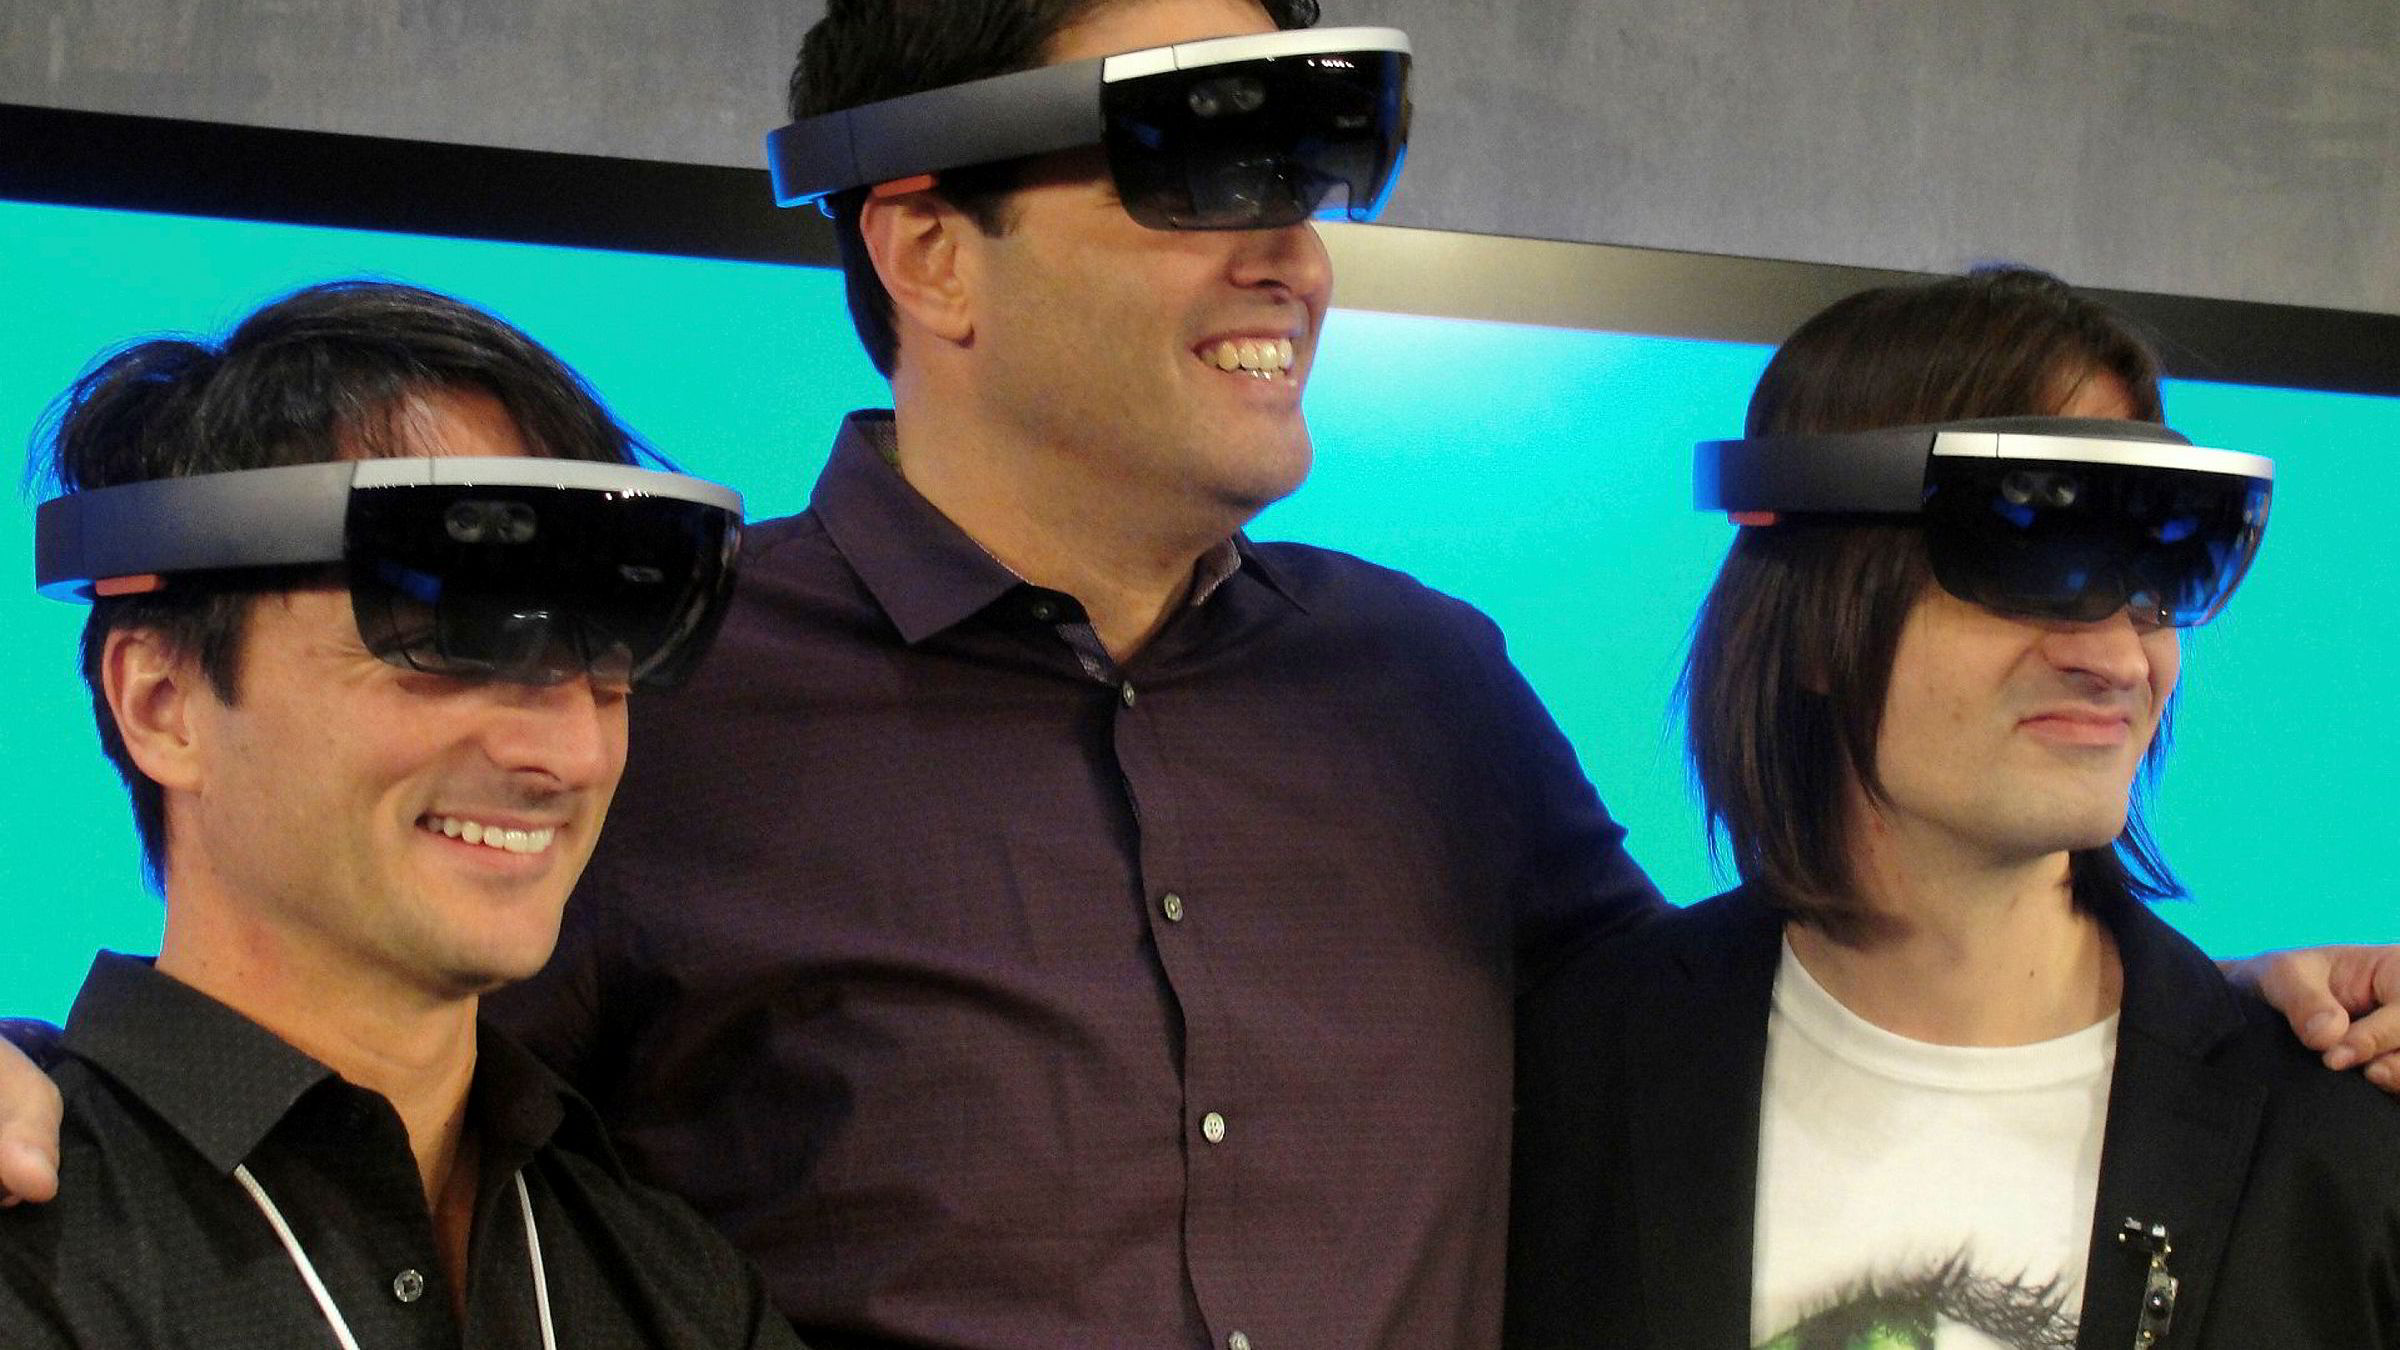 Microsoft-toppene Joe Belfiore (til venstre), Terry Myerson og Alex Kipman poserer med HoloLens-briller.